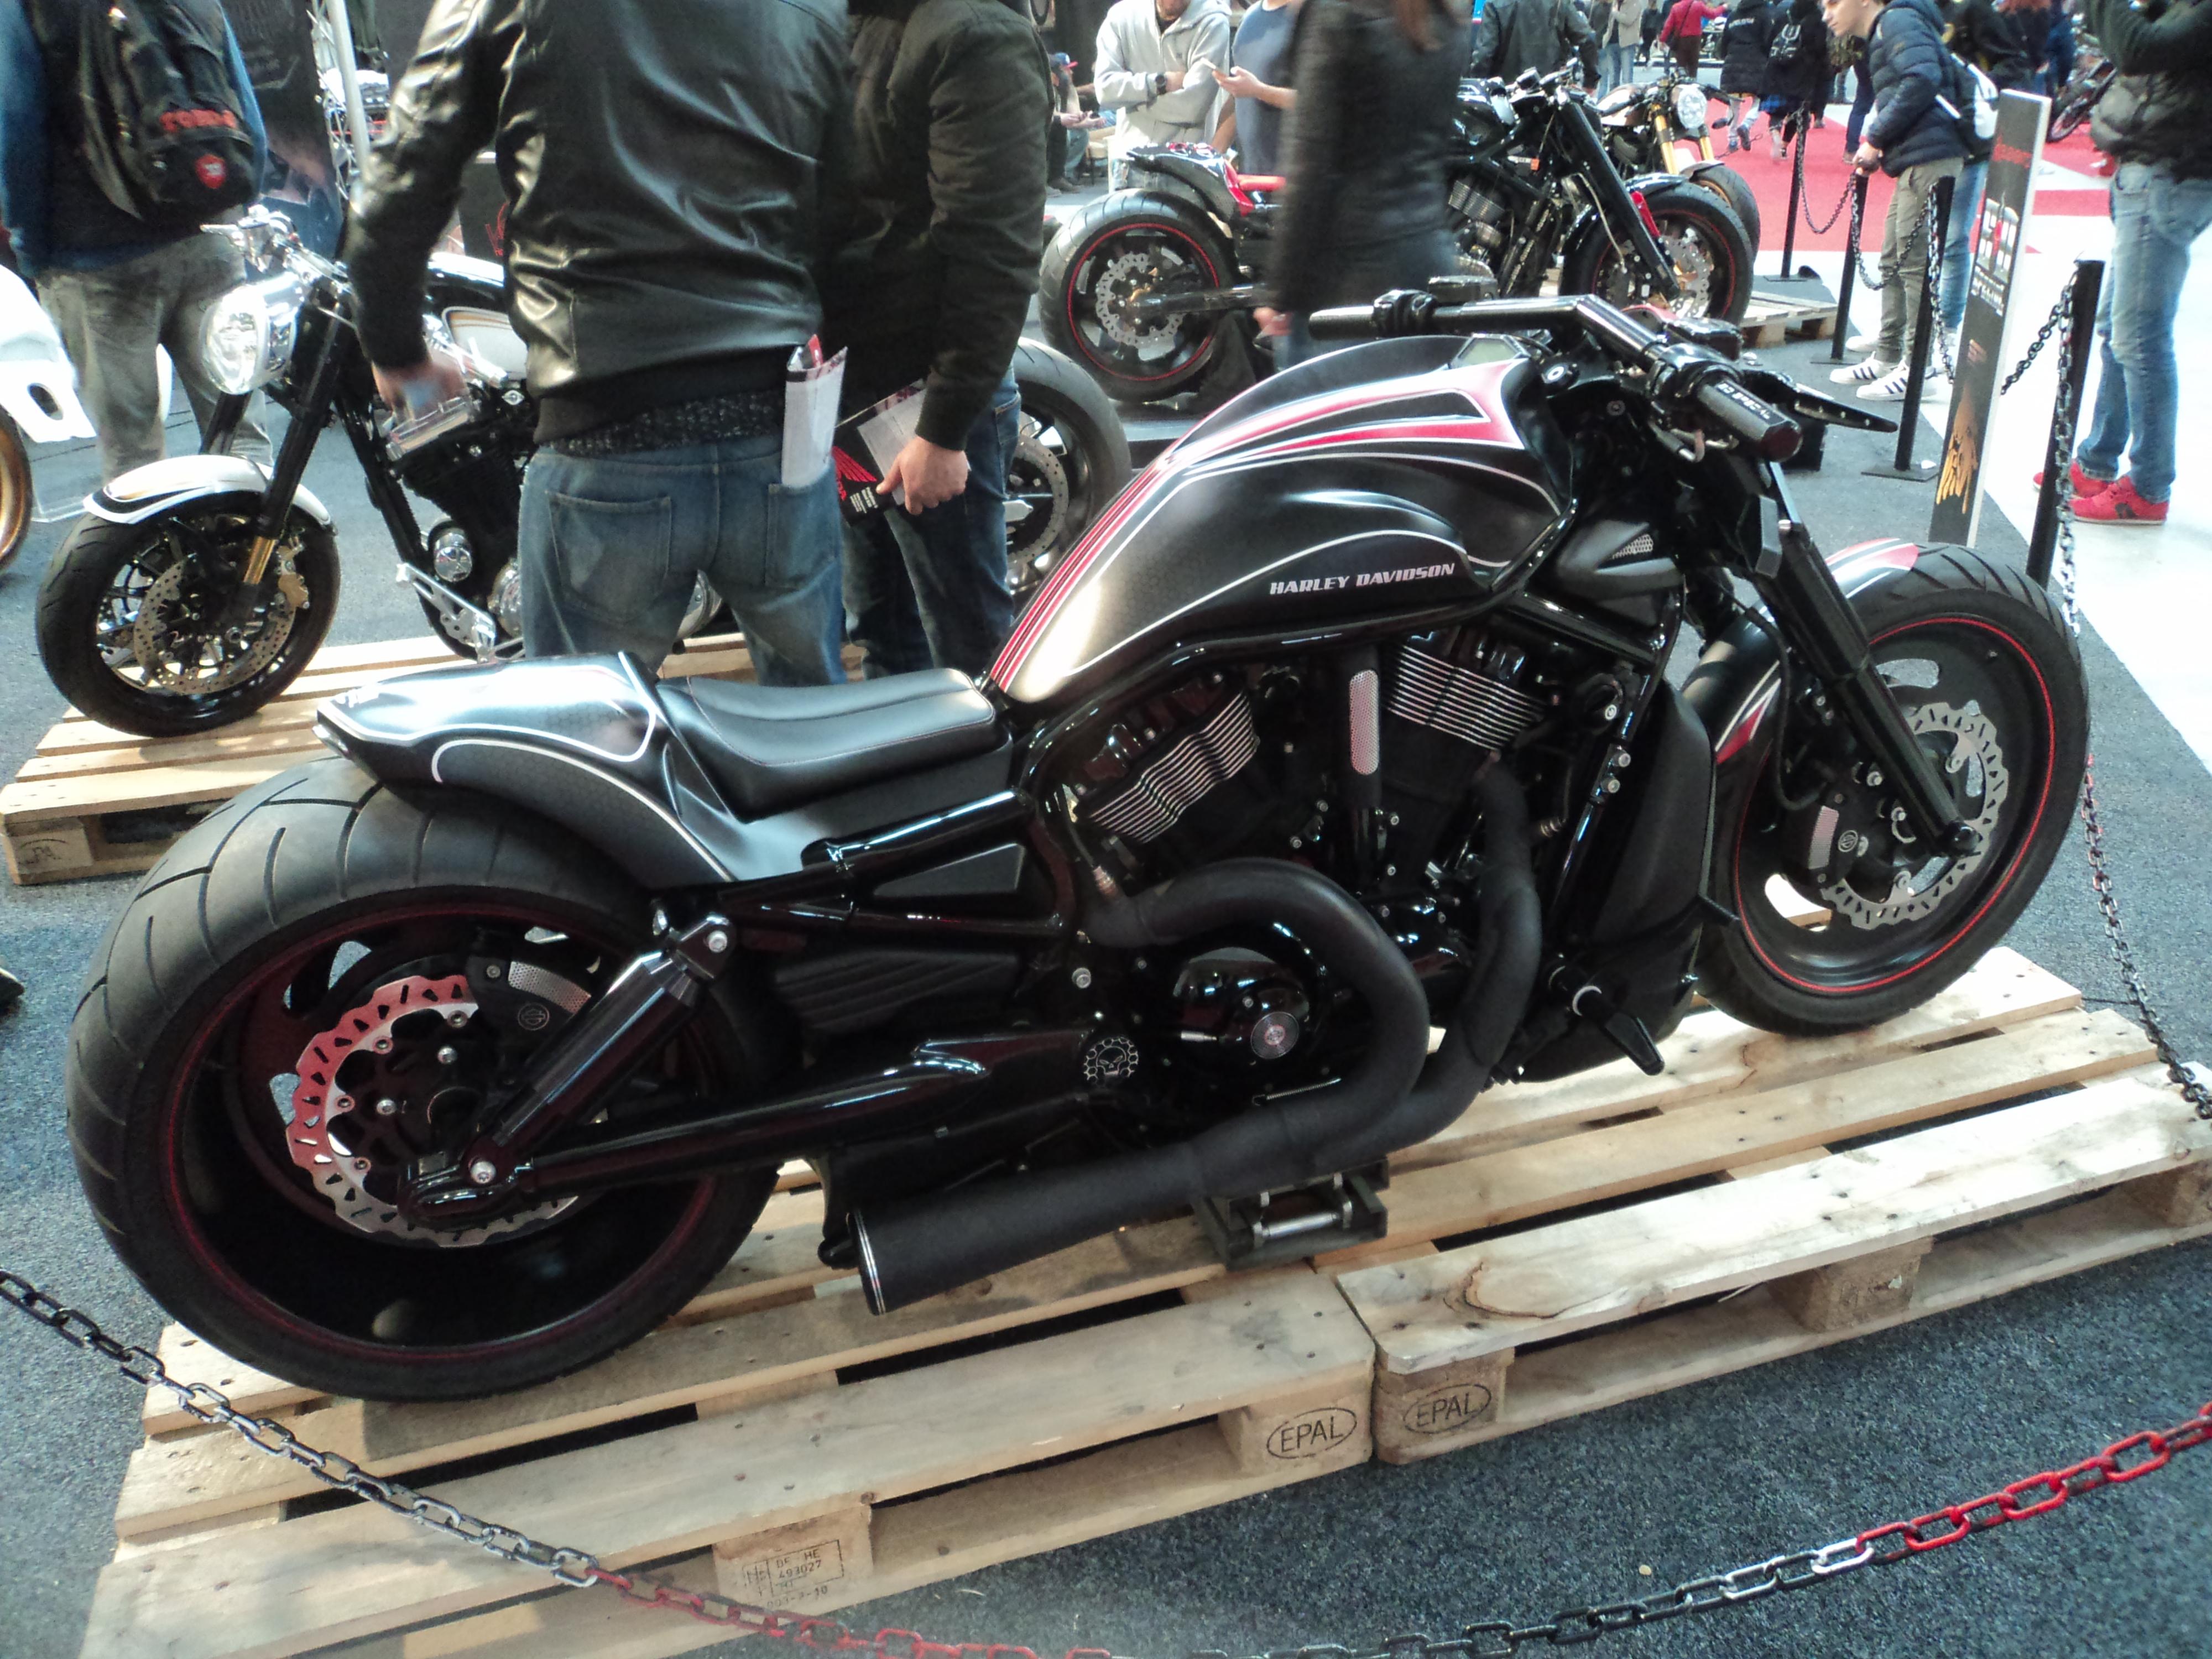 File Harley Davidson Motorcycles Motodays 2017 04 Jpg Wikimedia